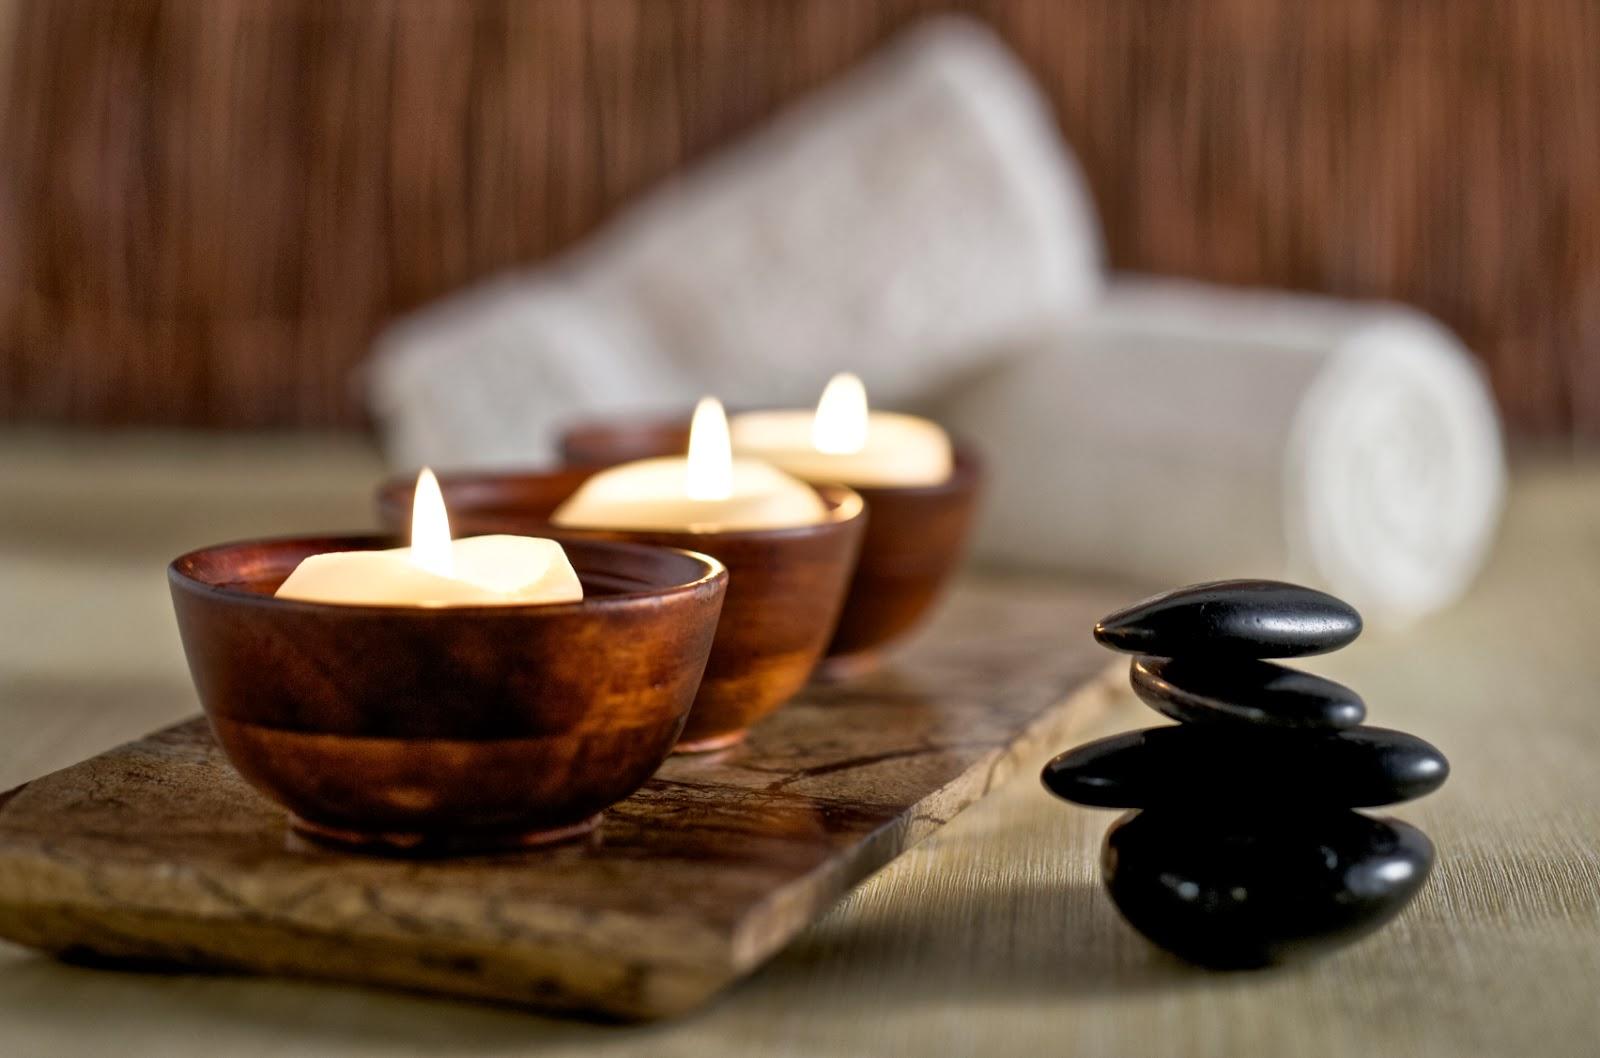 Sakura Massage And Spa Batam Tripadvisor: March 2014